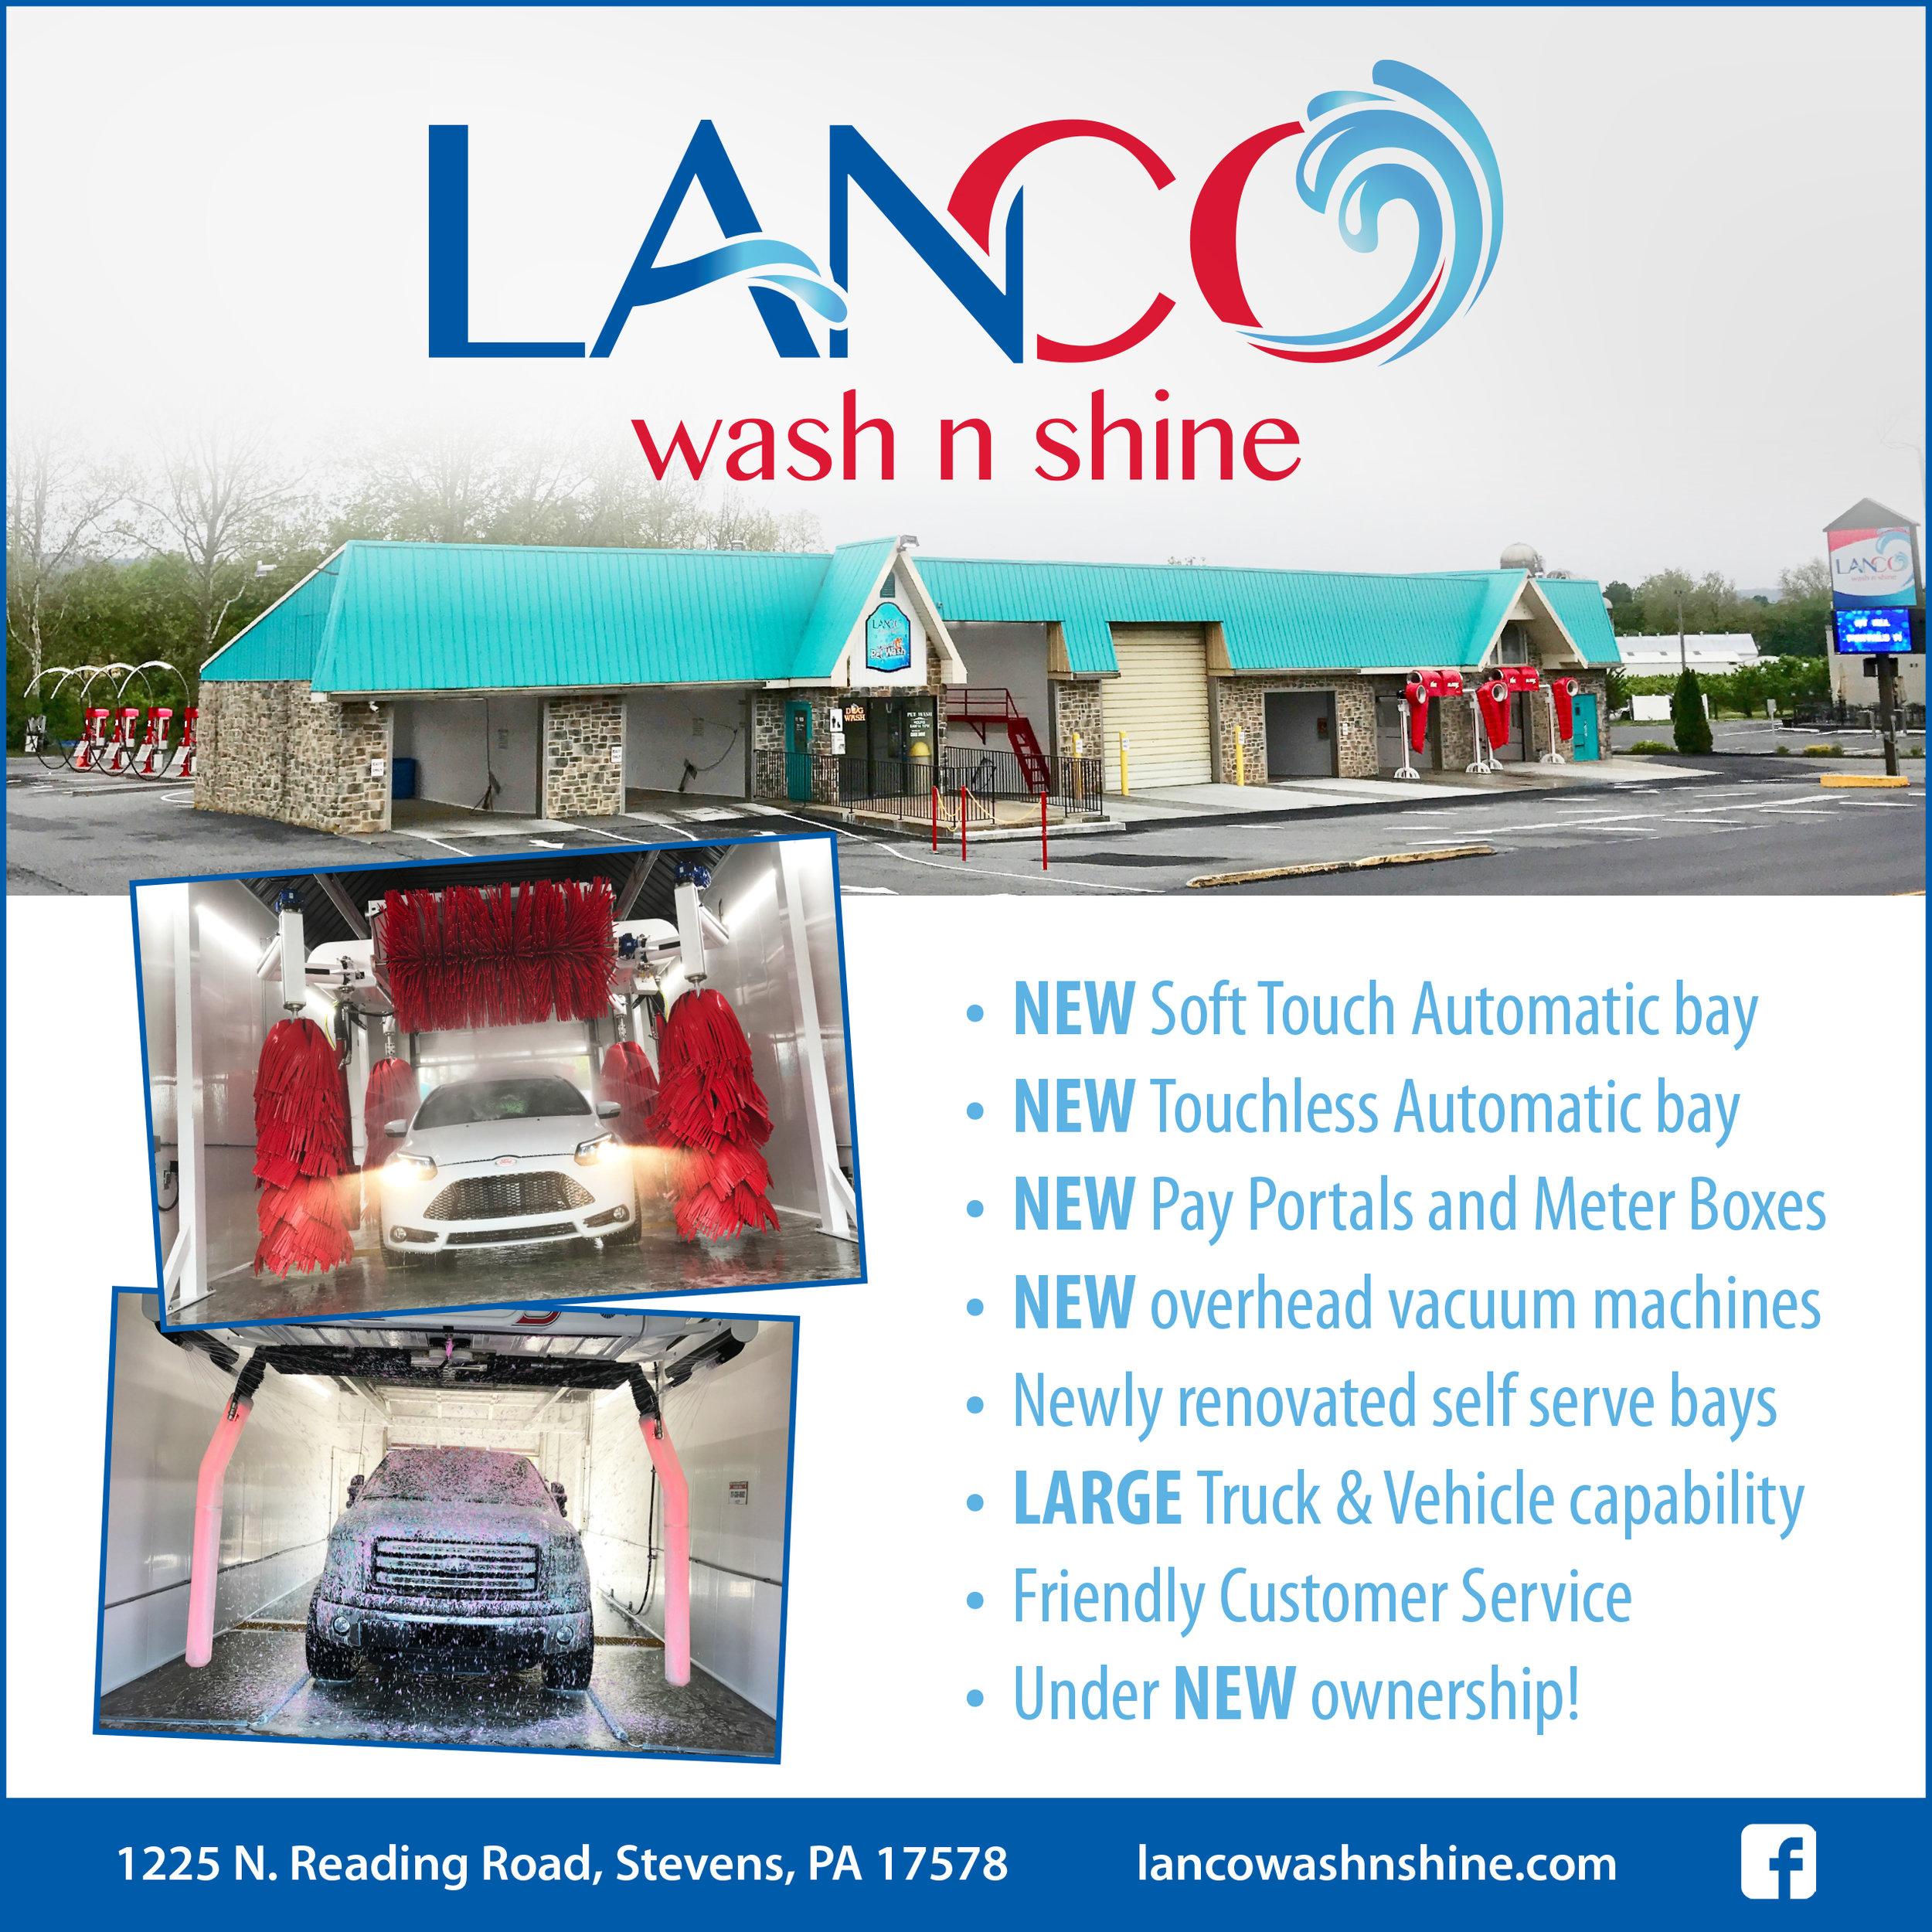 Lanco Wash n Shine_Front Page Ad_FINAL.jpg